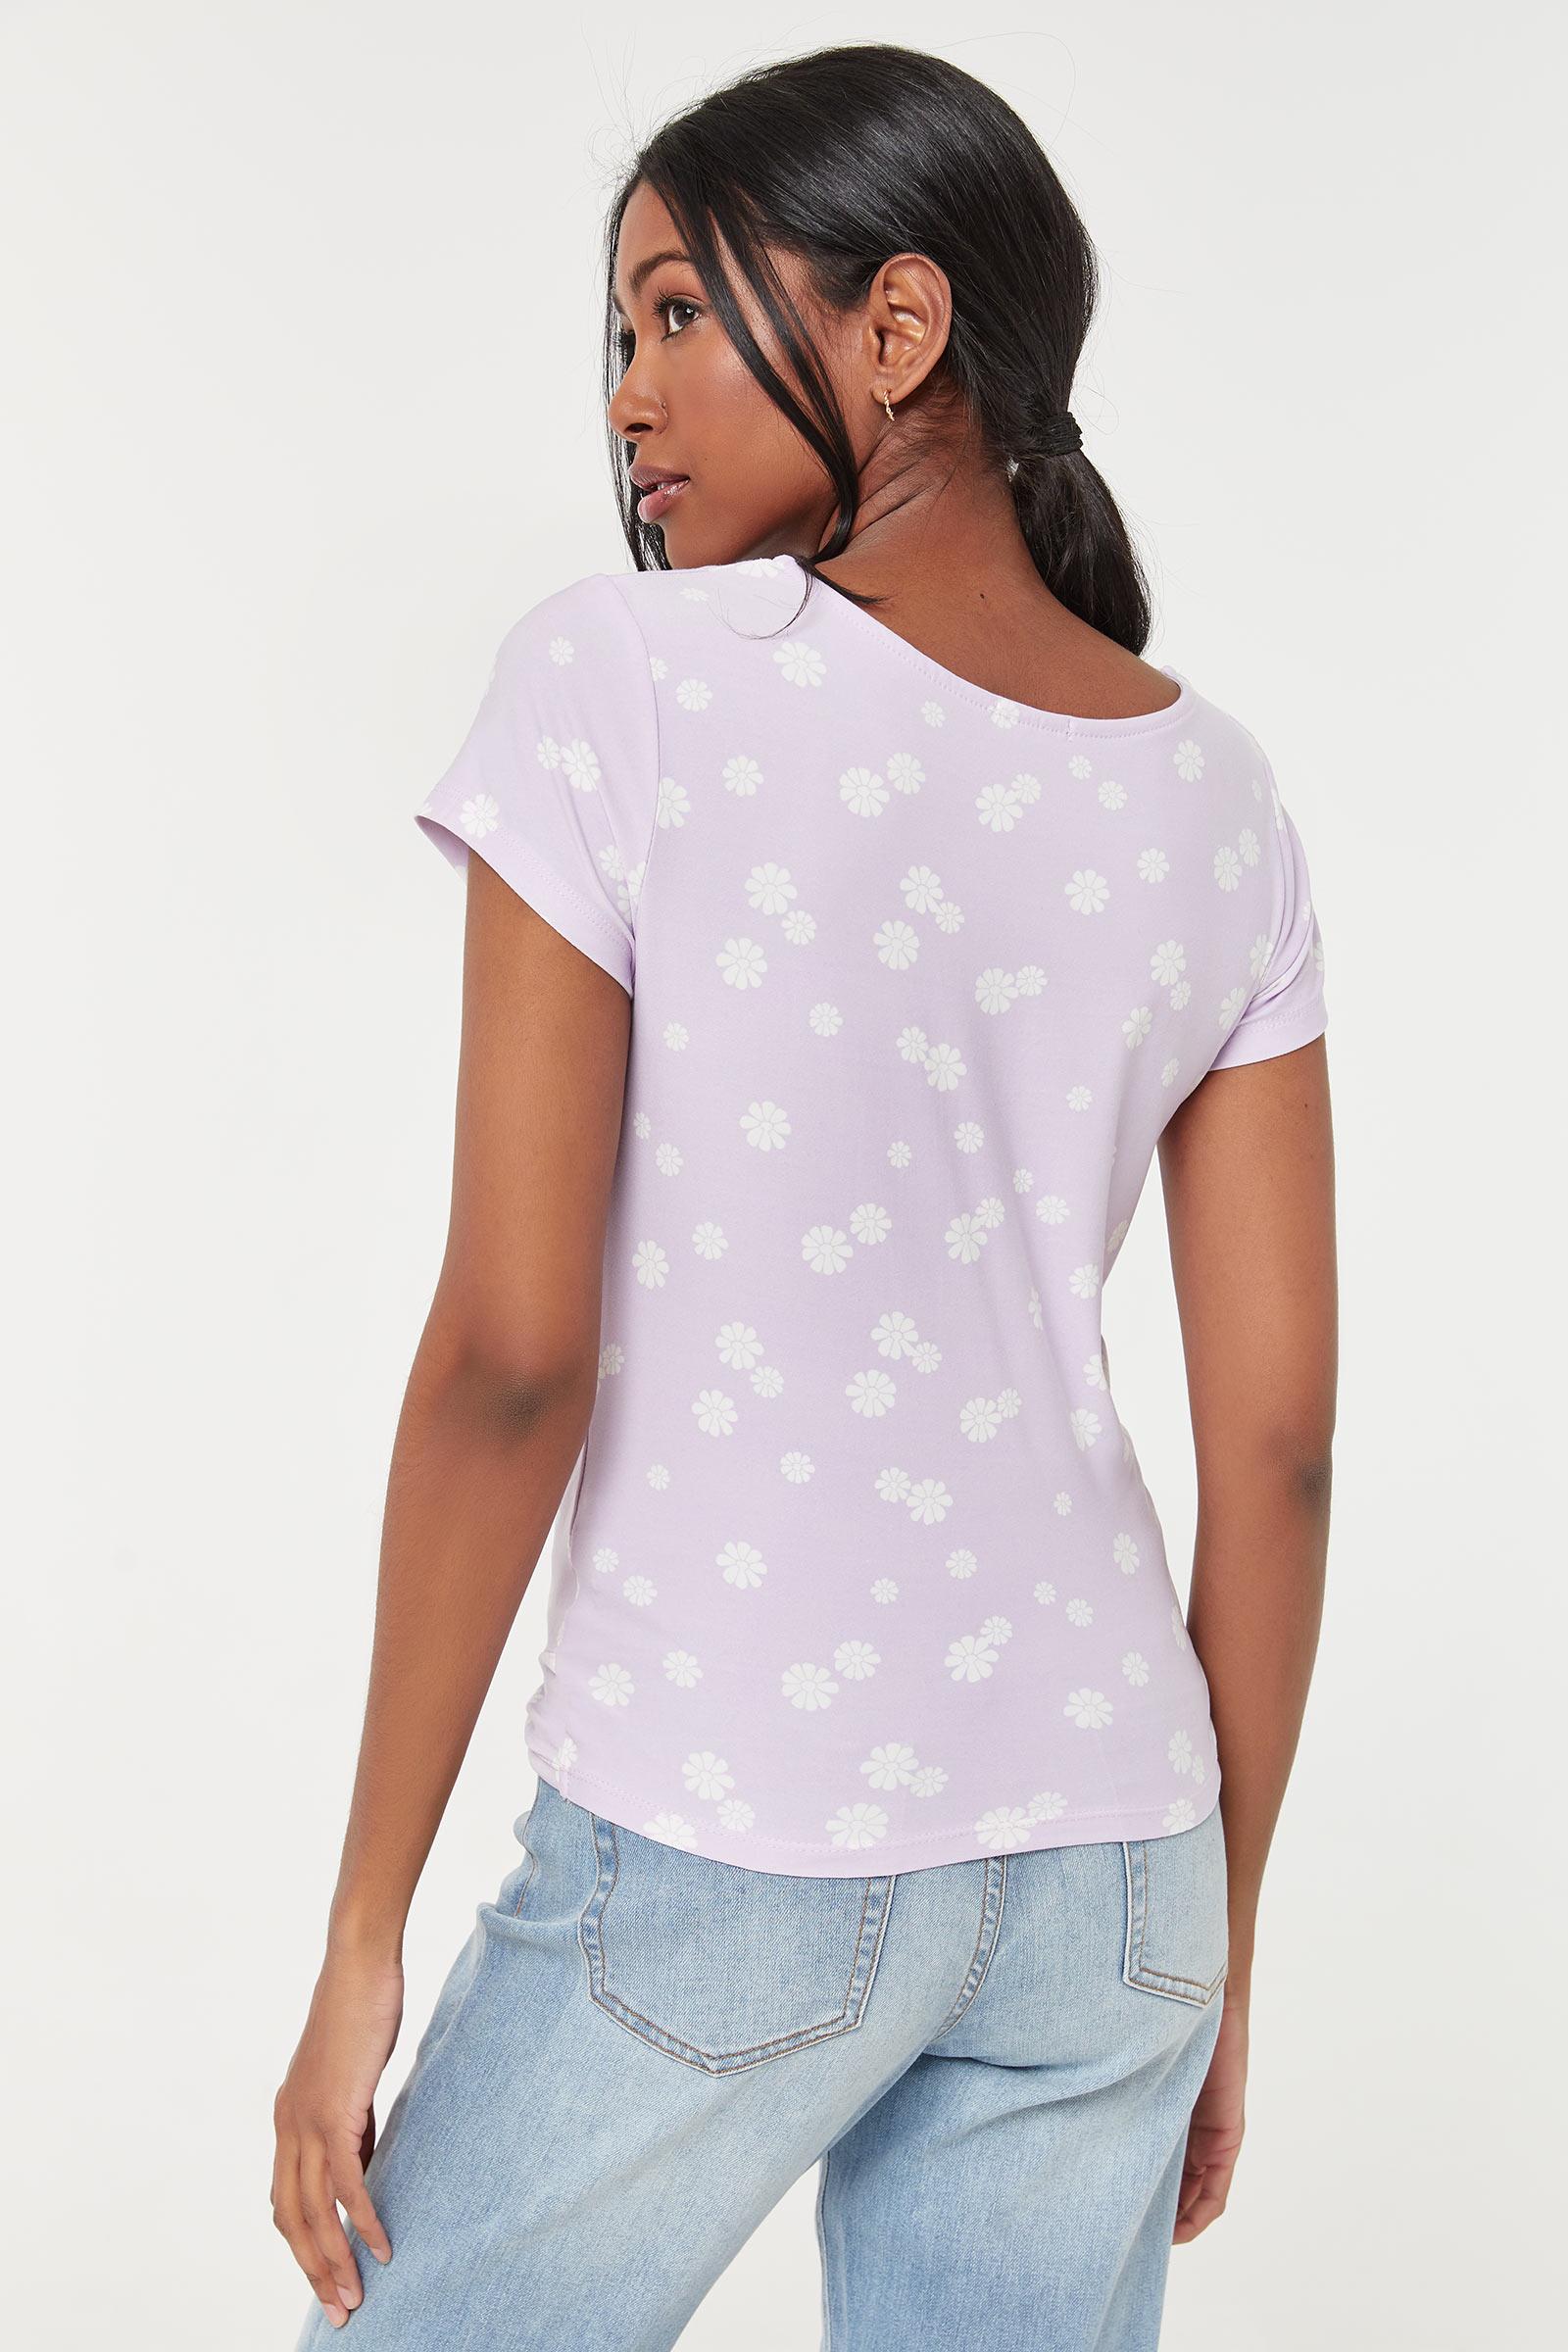 Floral Lavender Twisted T-shirt